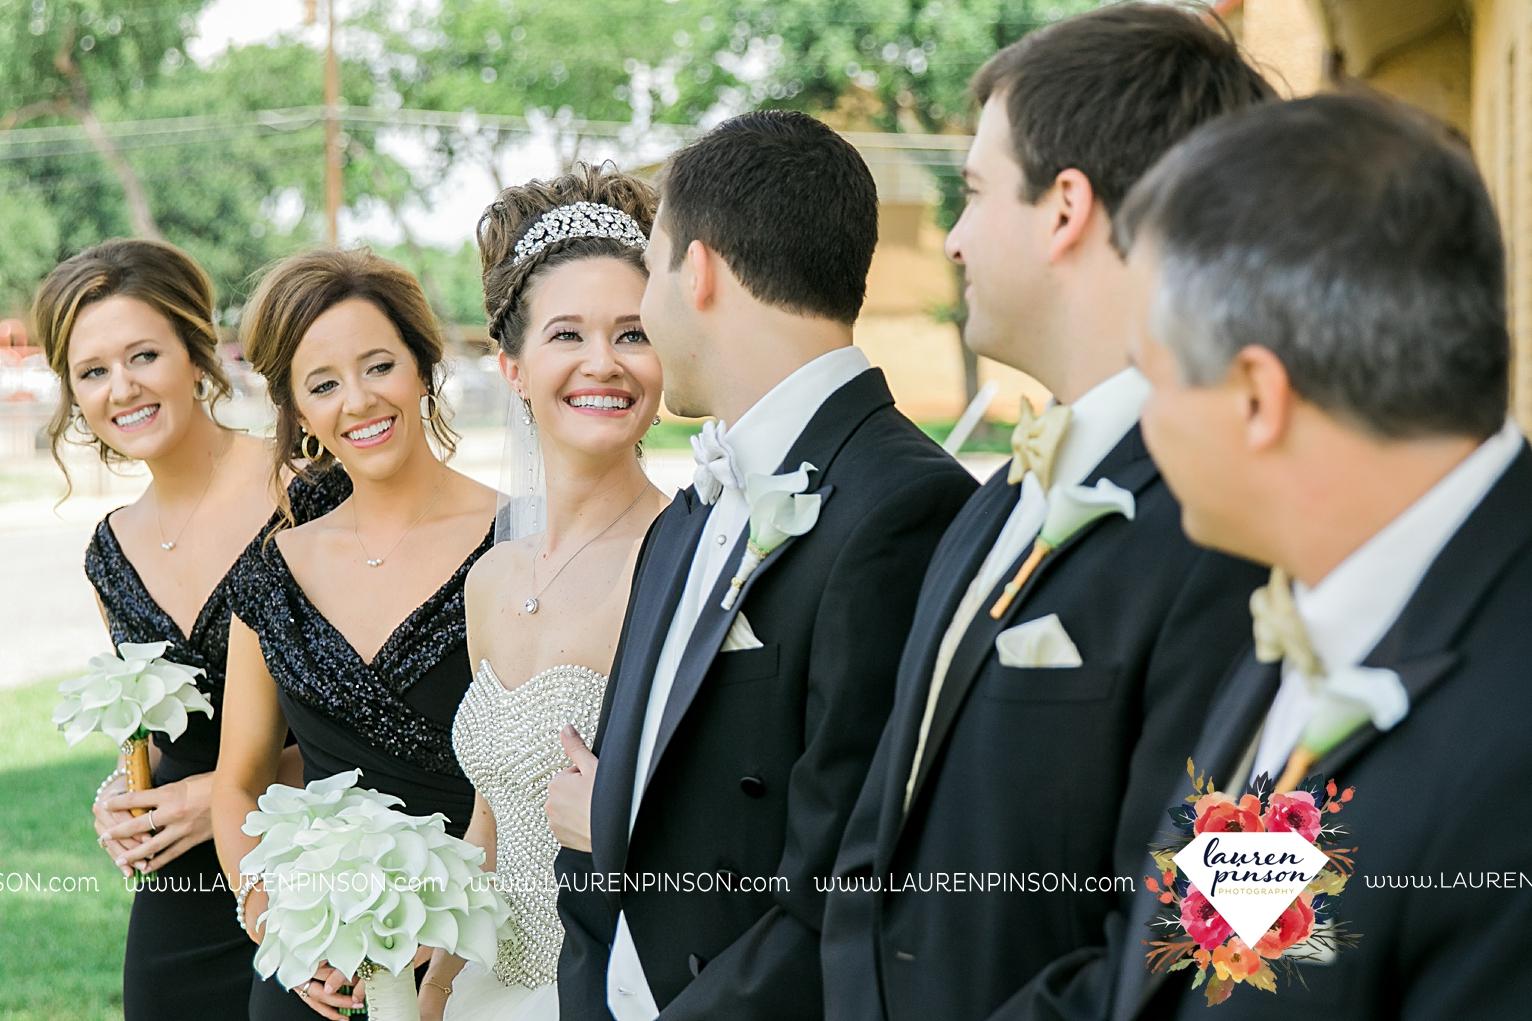 wichita-falls-texas-wedding-photographer-the-forum-by-the-kemp-mayfield-events-ulta-gold-glitter_2845.jpg